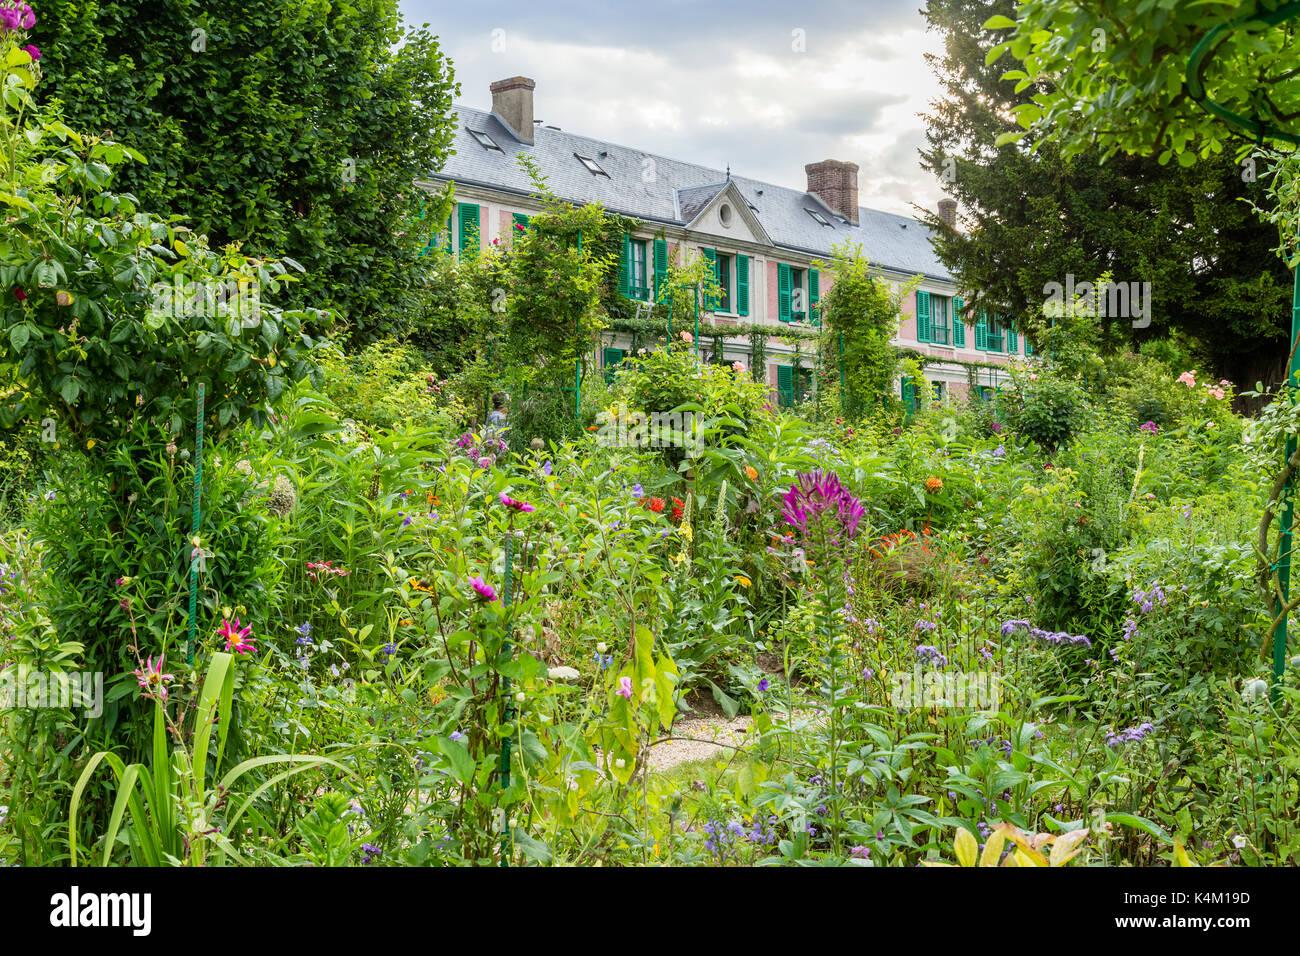 France, Eure (27), Giverny, jardin et maison du peintre Claude Monet // France, Eure, Giverny, garden and house of the painter Claude Monet - Stock Image